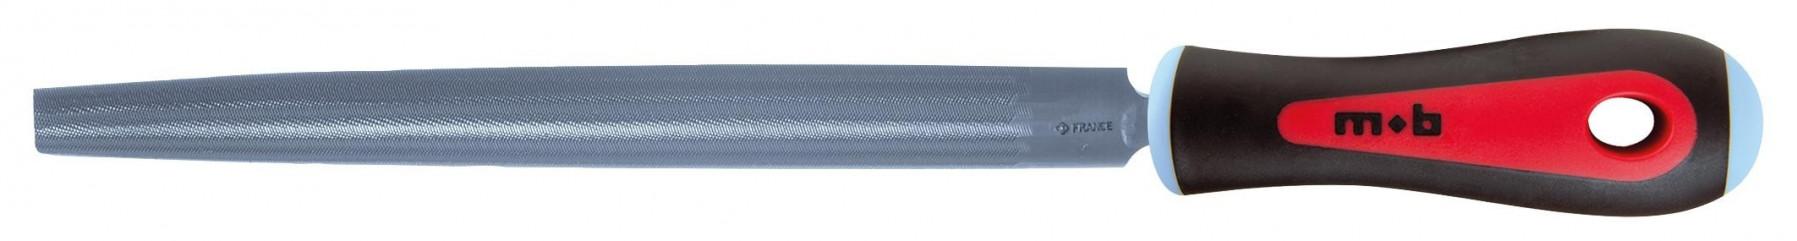 Lime demi-ronde mi-douce MOB MONDELIN 250 x 25 x 7 mm - 0910256201